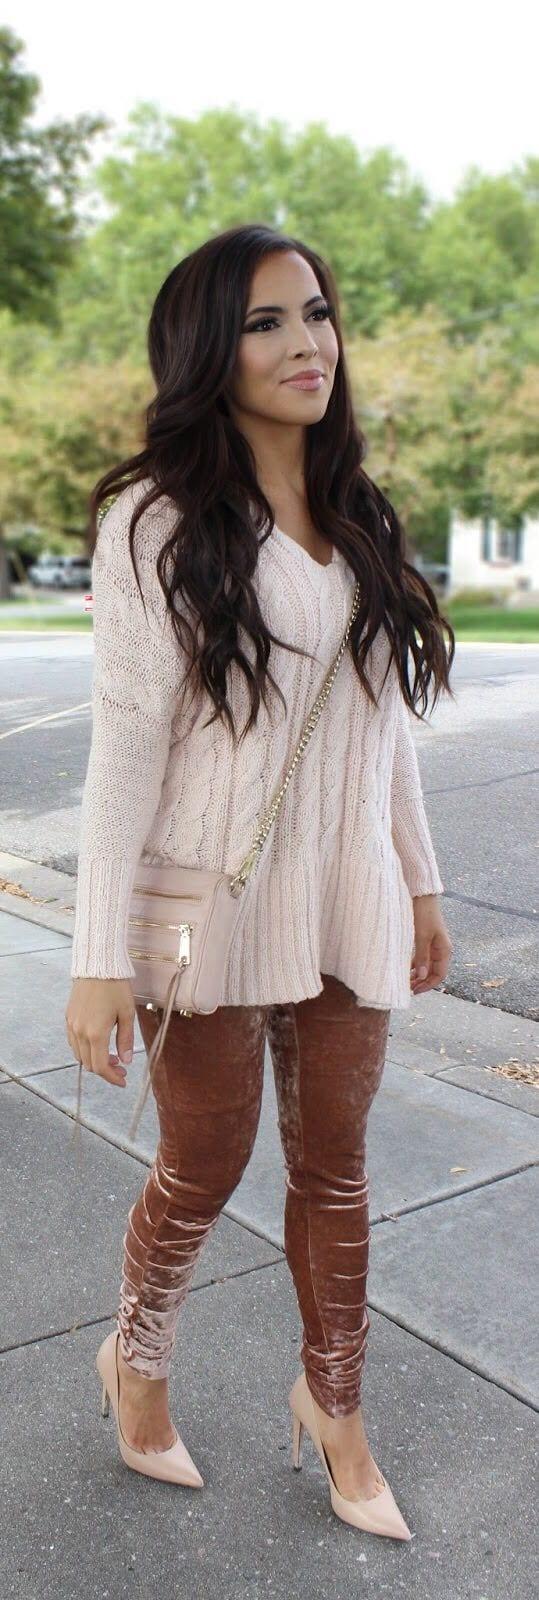 Outfits with Velvet Leggings (5)